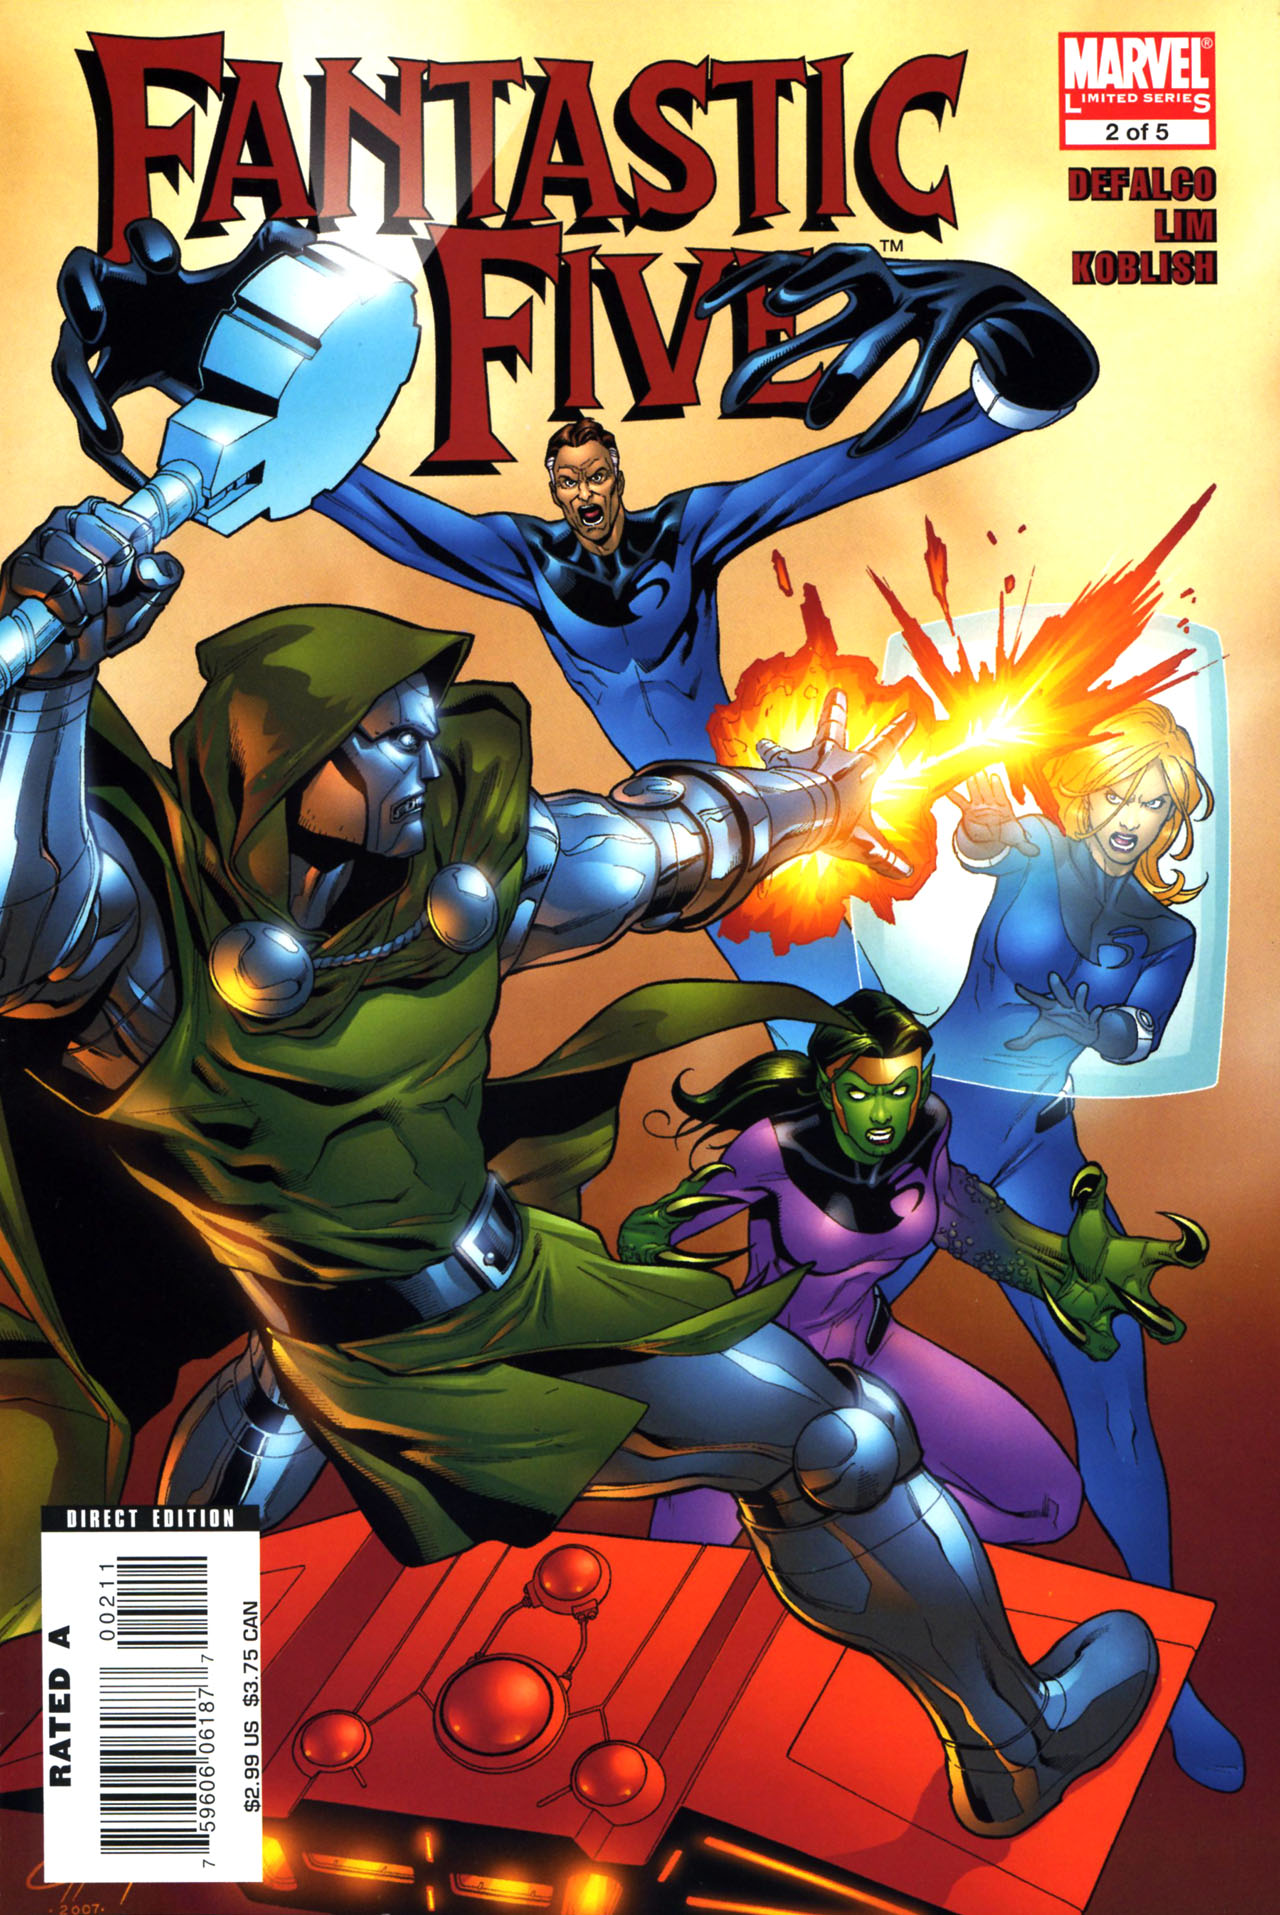 Read online Fantastic Five (2007) comic -  Issue #2 - 1